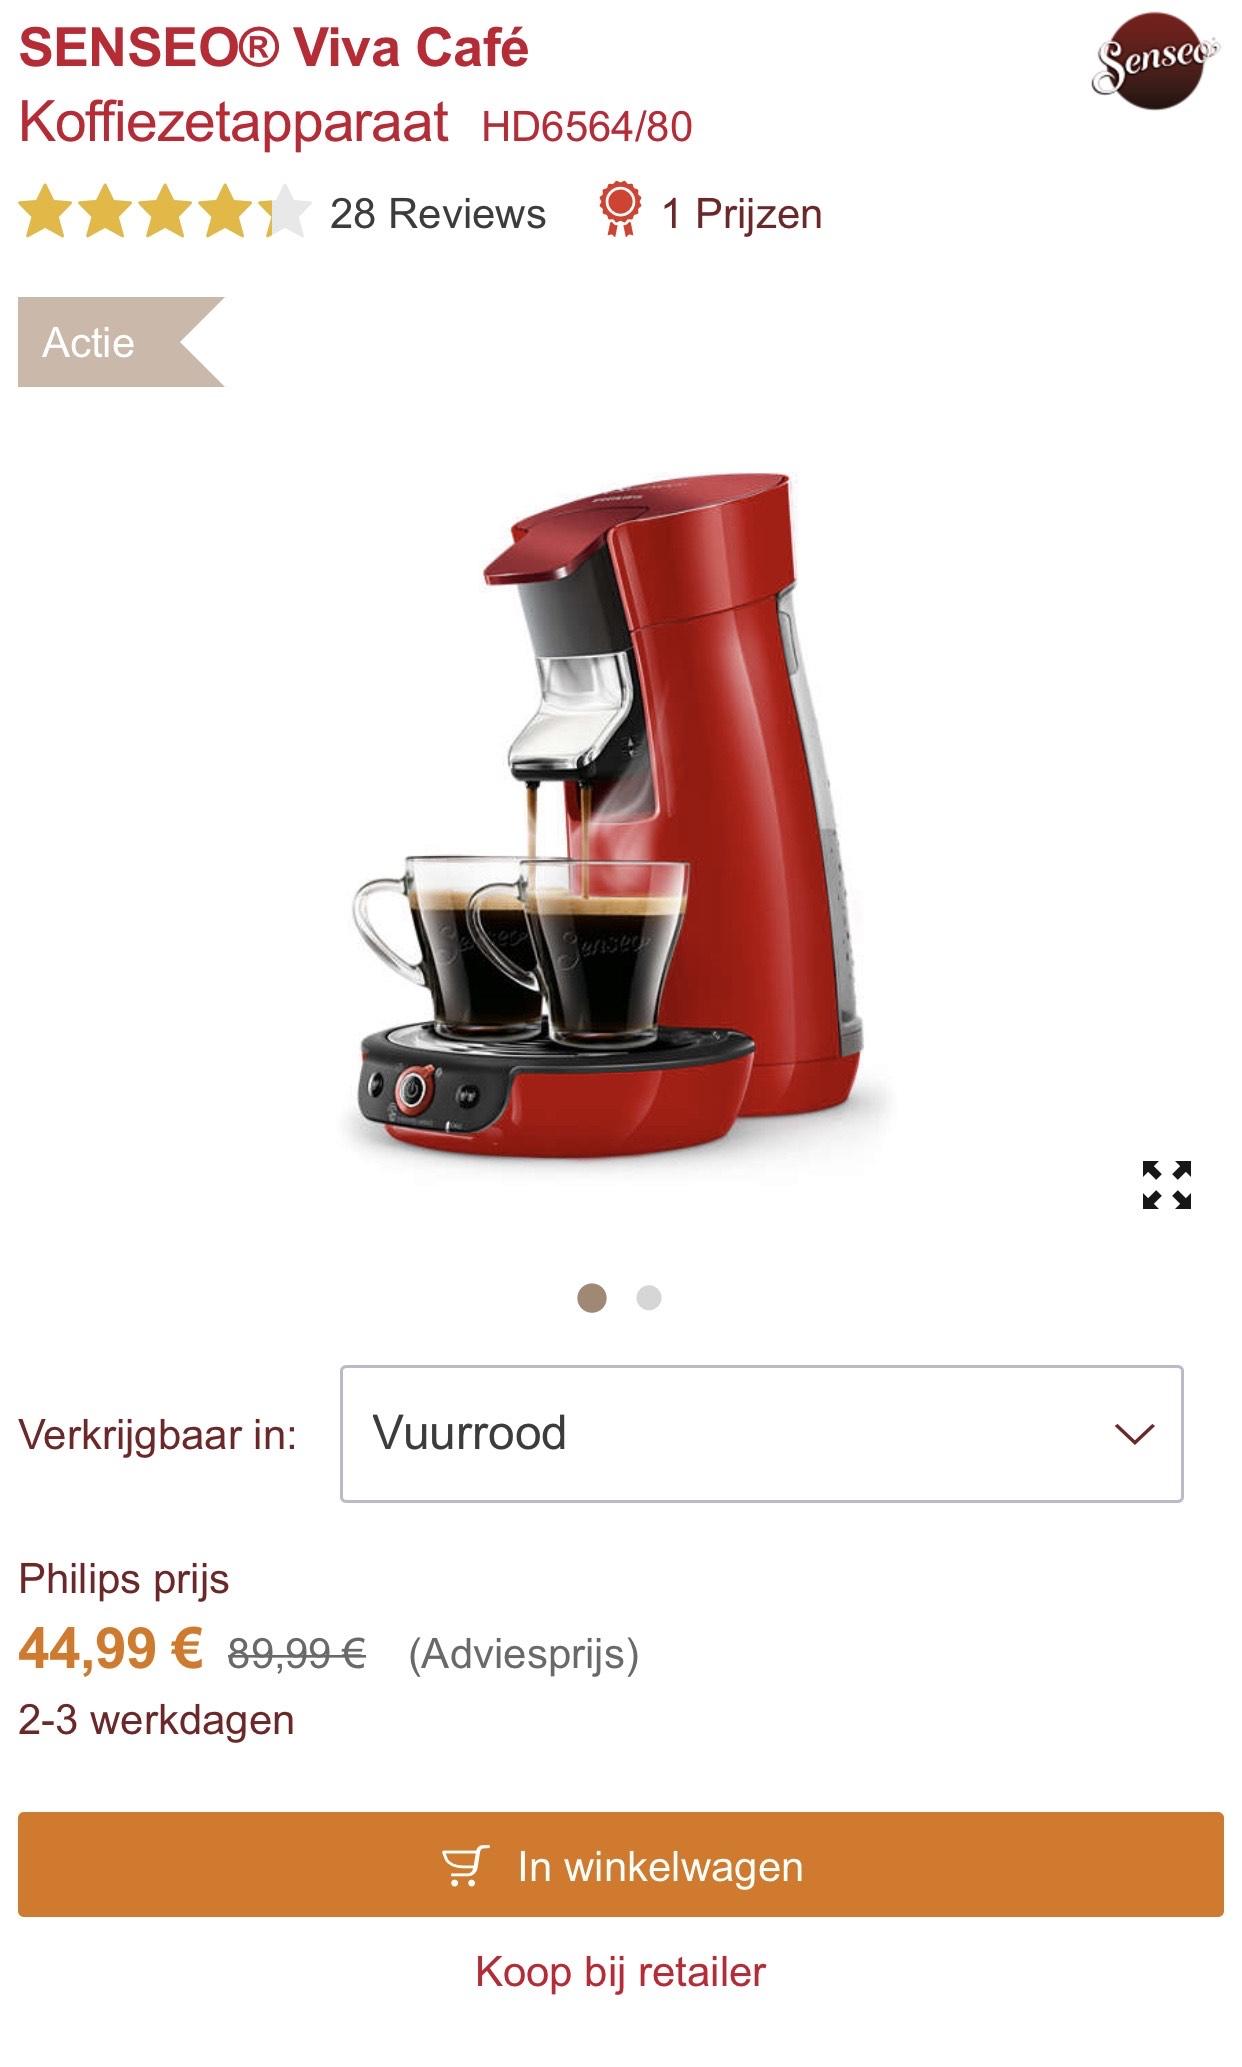 [België] Senseo Viva Café (vuurrood)